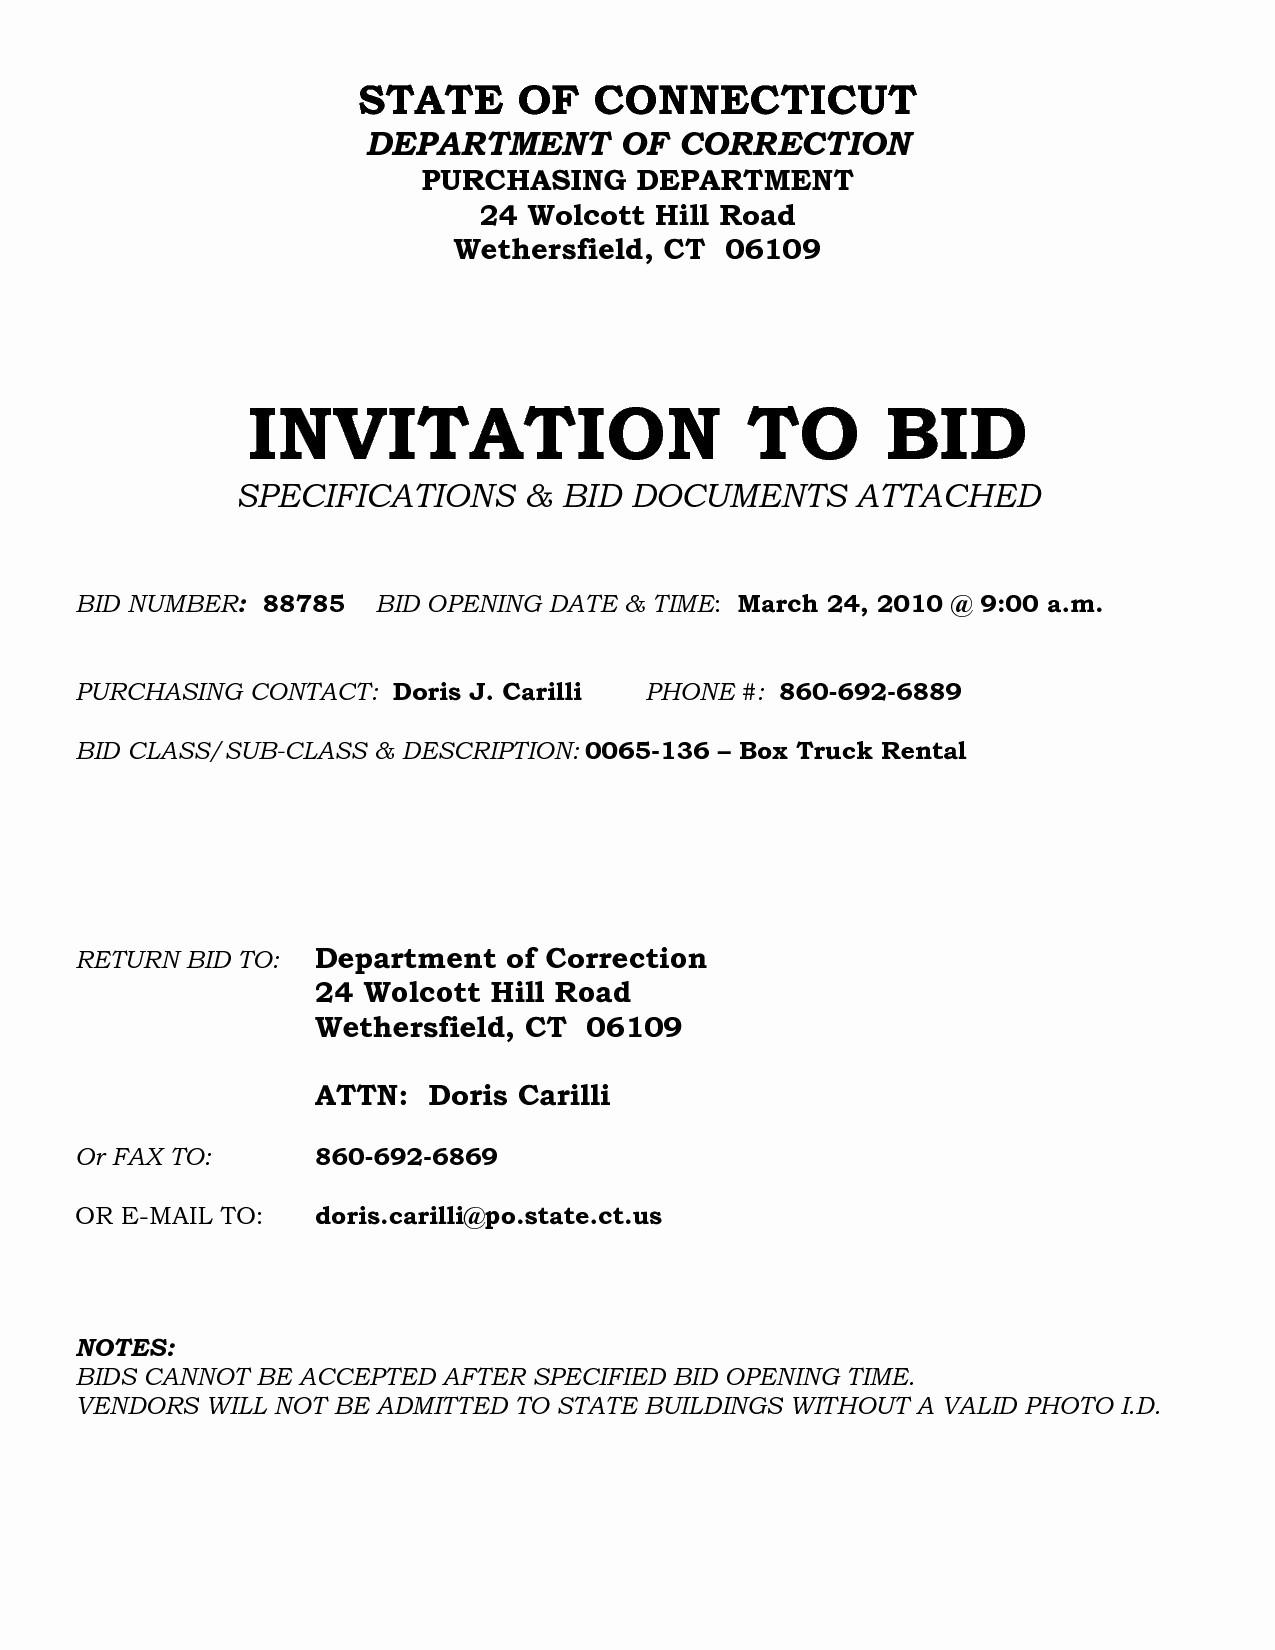 Invitation to Bid Template Construction Luxury Invitation to Bid Letter Template Examples